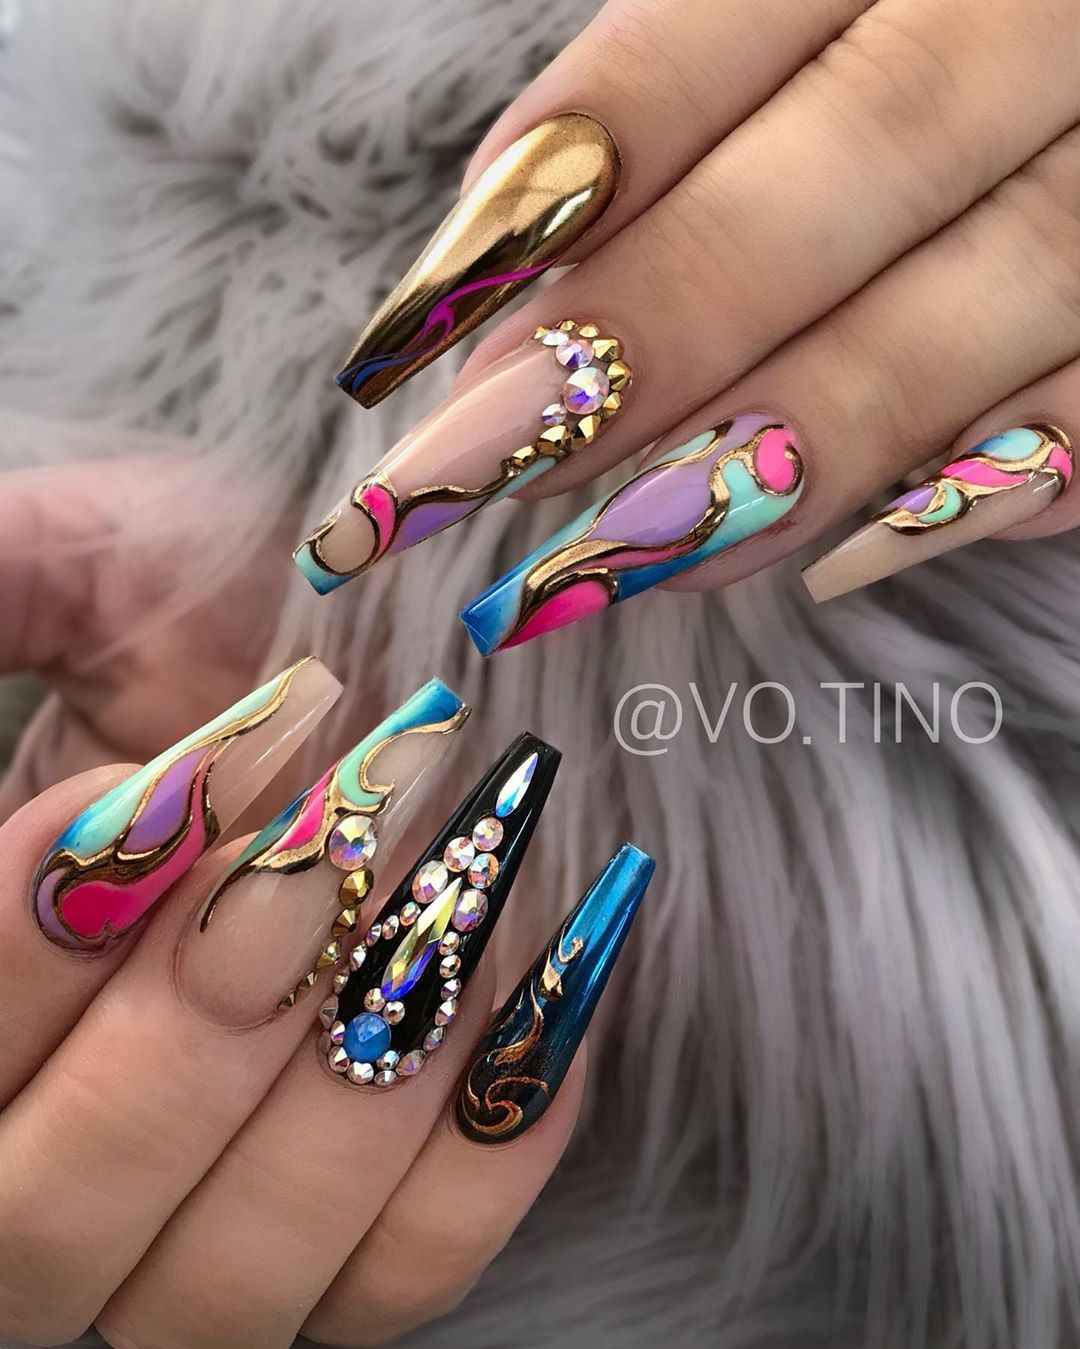 Tino Turn On Post Notification On Instagram Both Set Using Joyamia Aluminix Joyamiaofficial Use Code Tin Bling Nails Beautiful Nail Designs Nail Designs